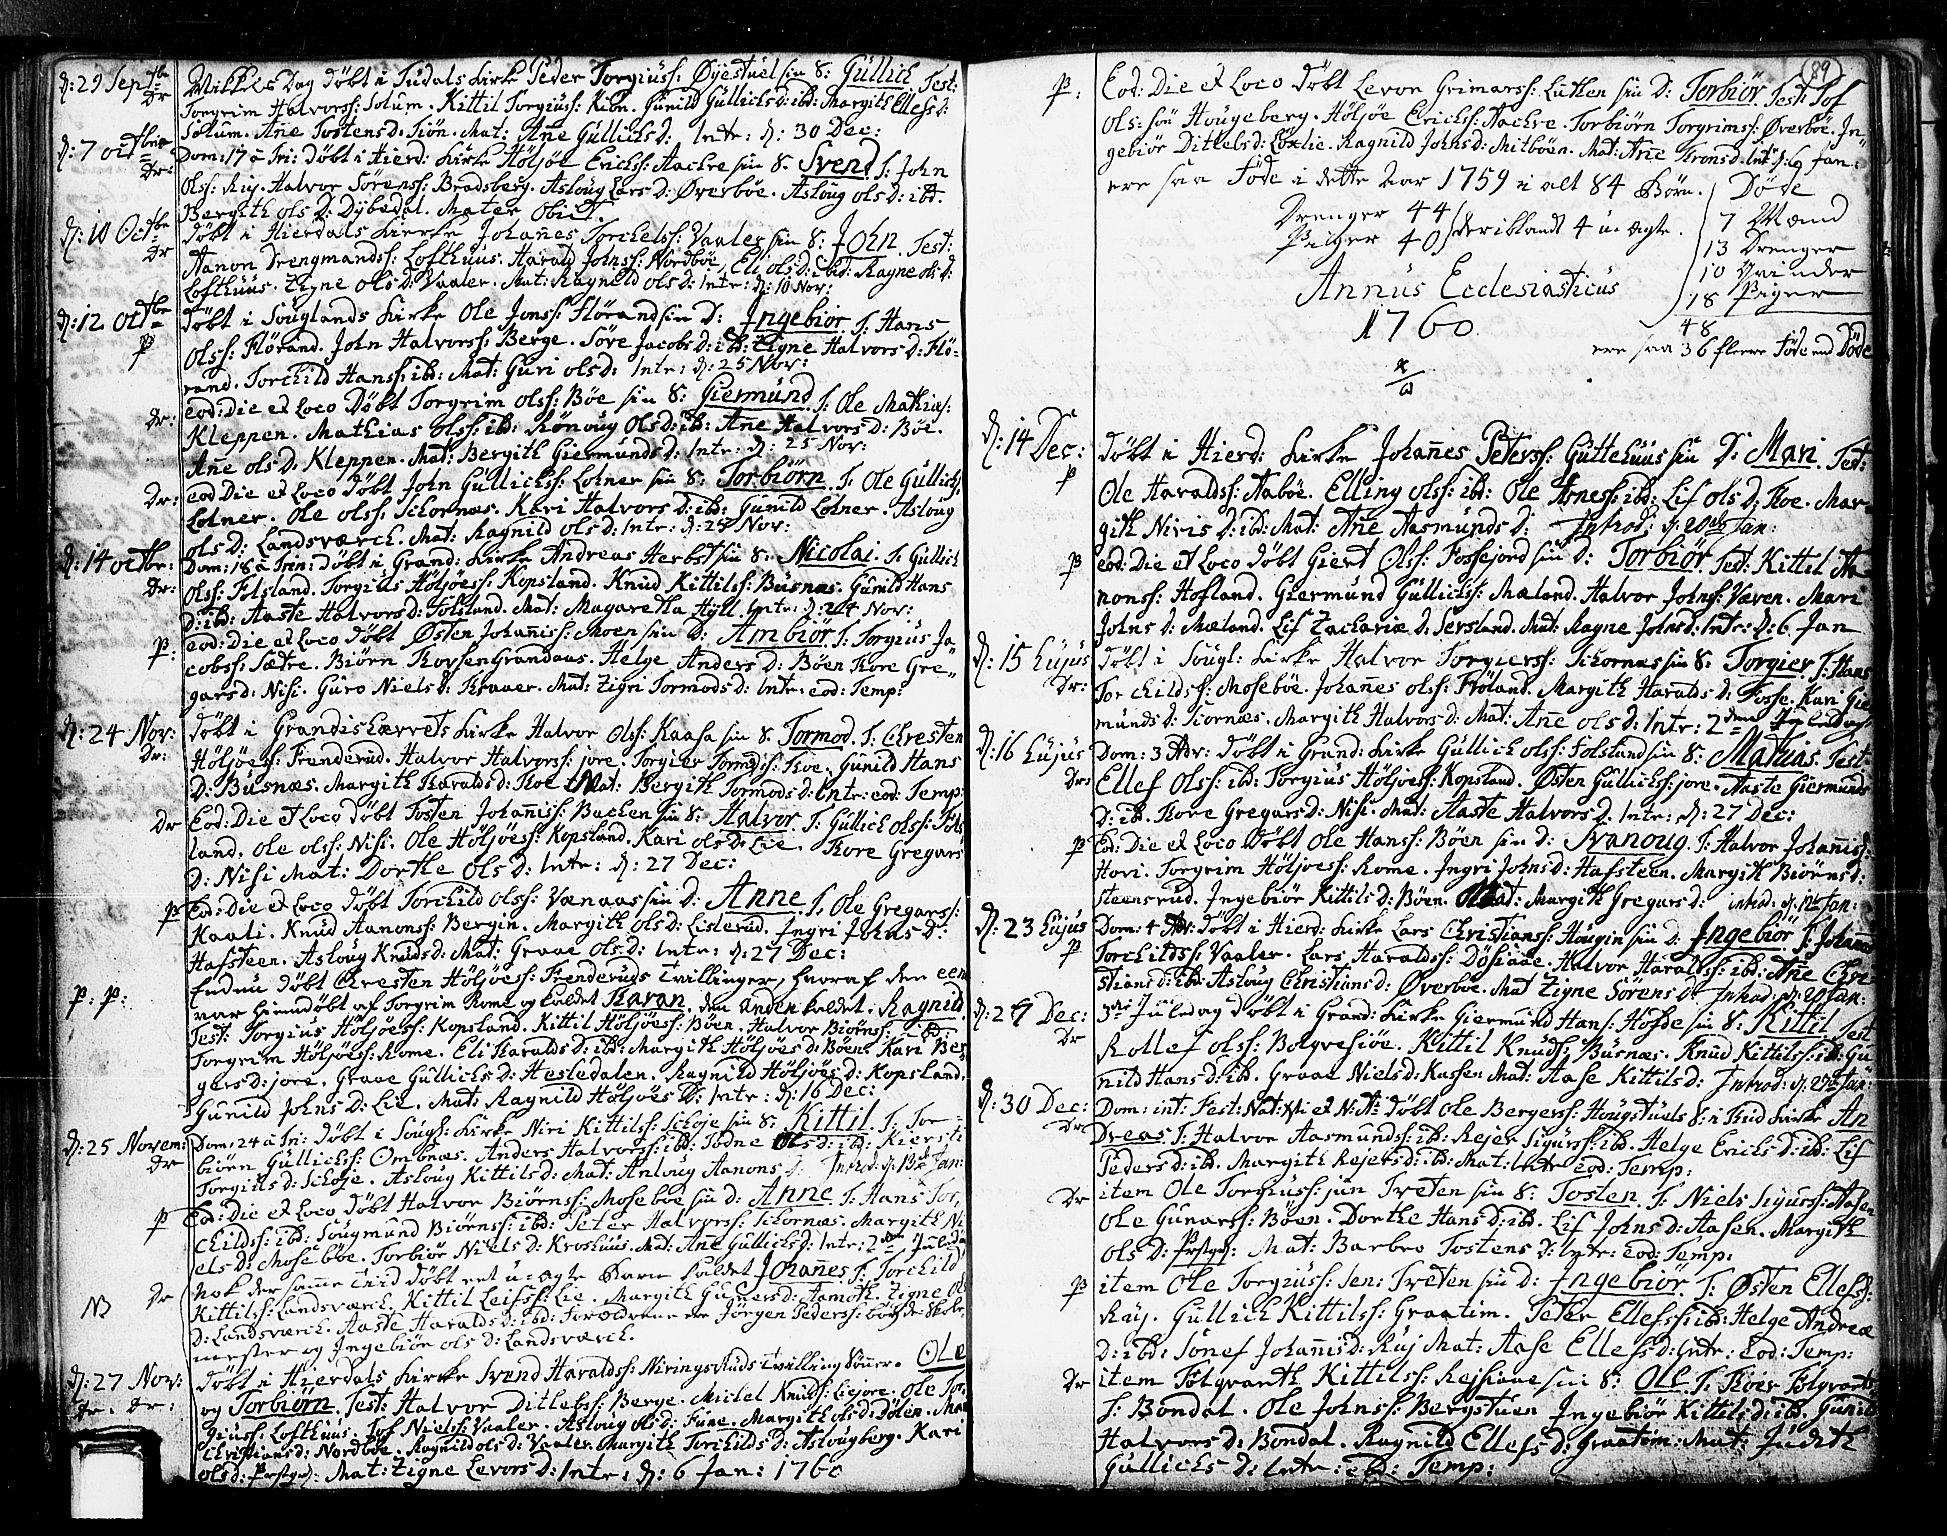 SAKO, Hjartdal kirkebøker, F/Fa/L0003: Ministerialbok nr. I 3, 1727-1775, s. 89